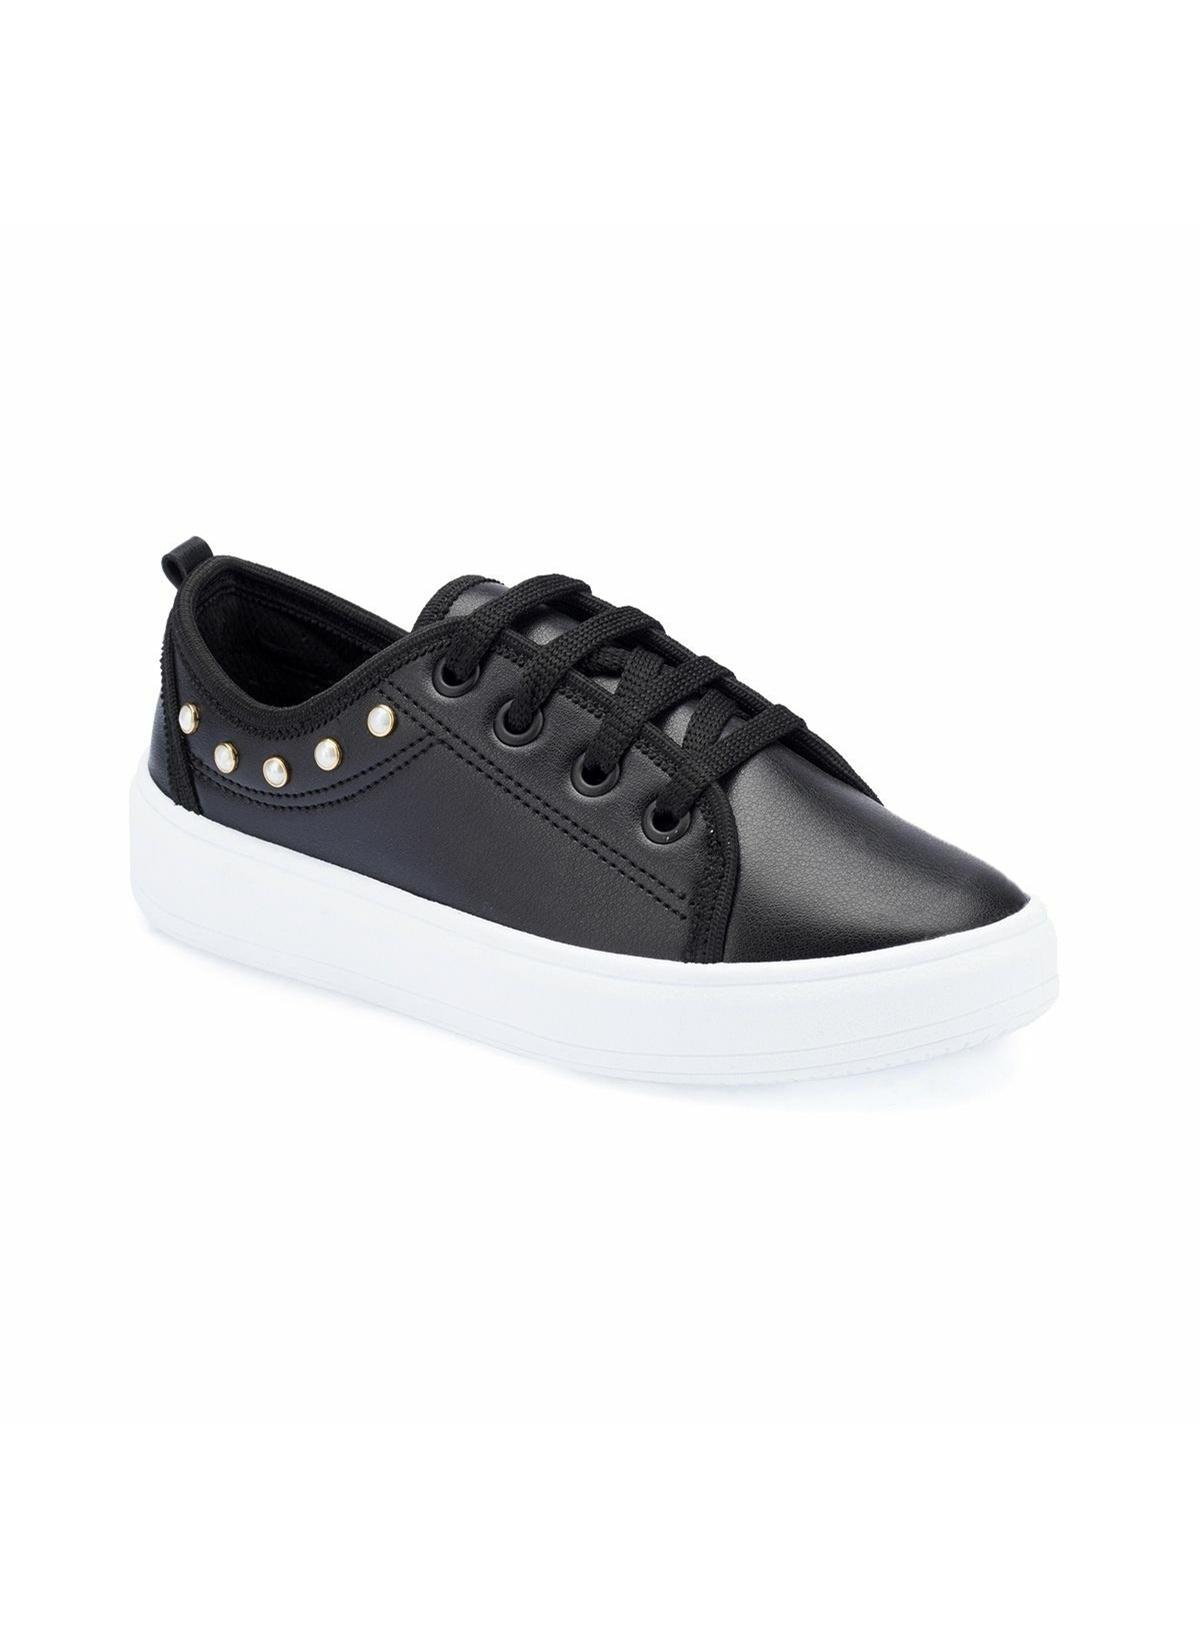 Polaris Sneakers 82.510825.f Sneaker Ayakkabı – 54.99 TL